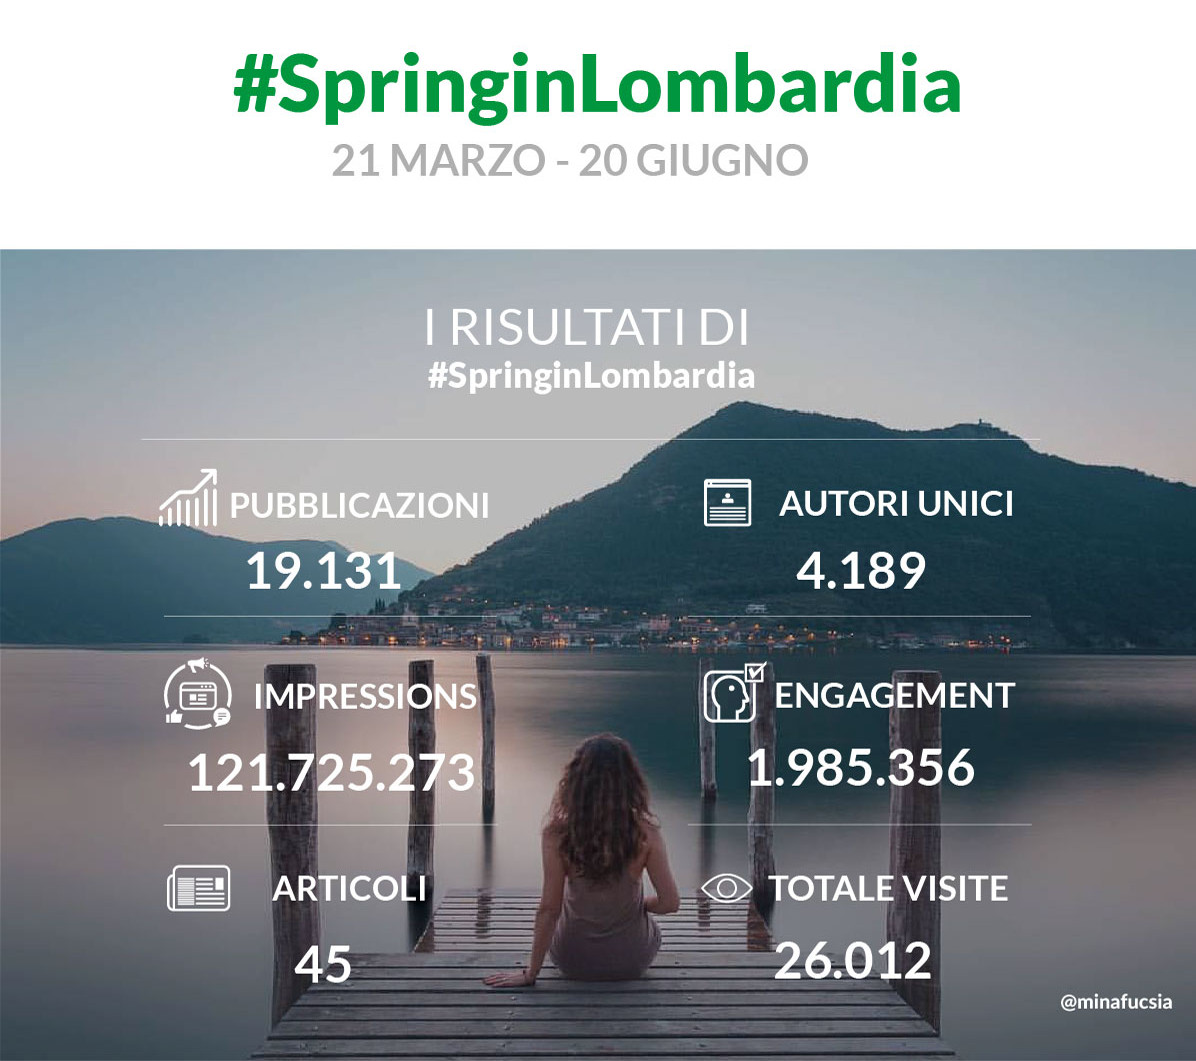 Grande successo per #Spring inLombardia